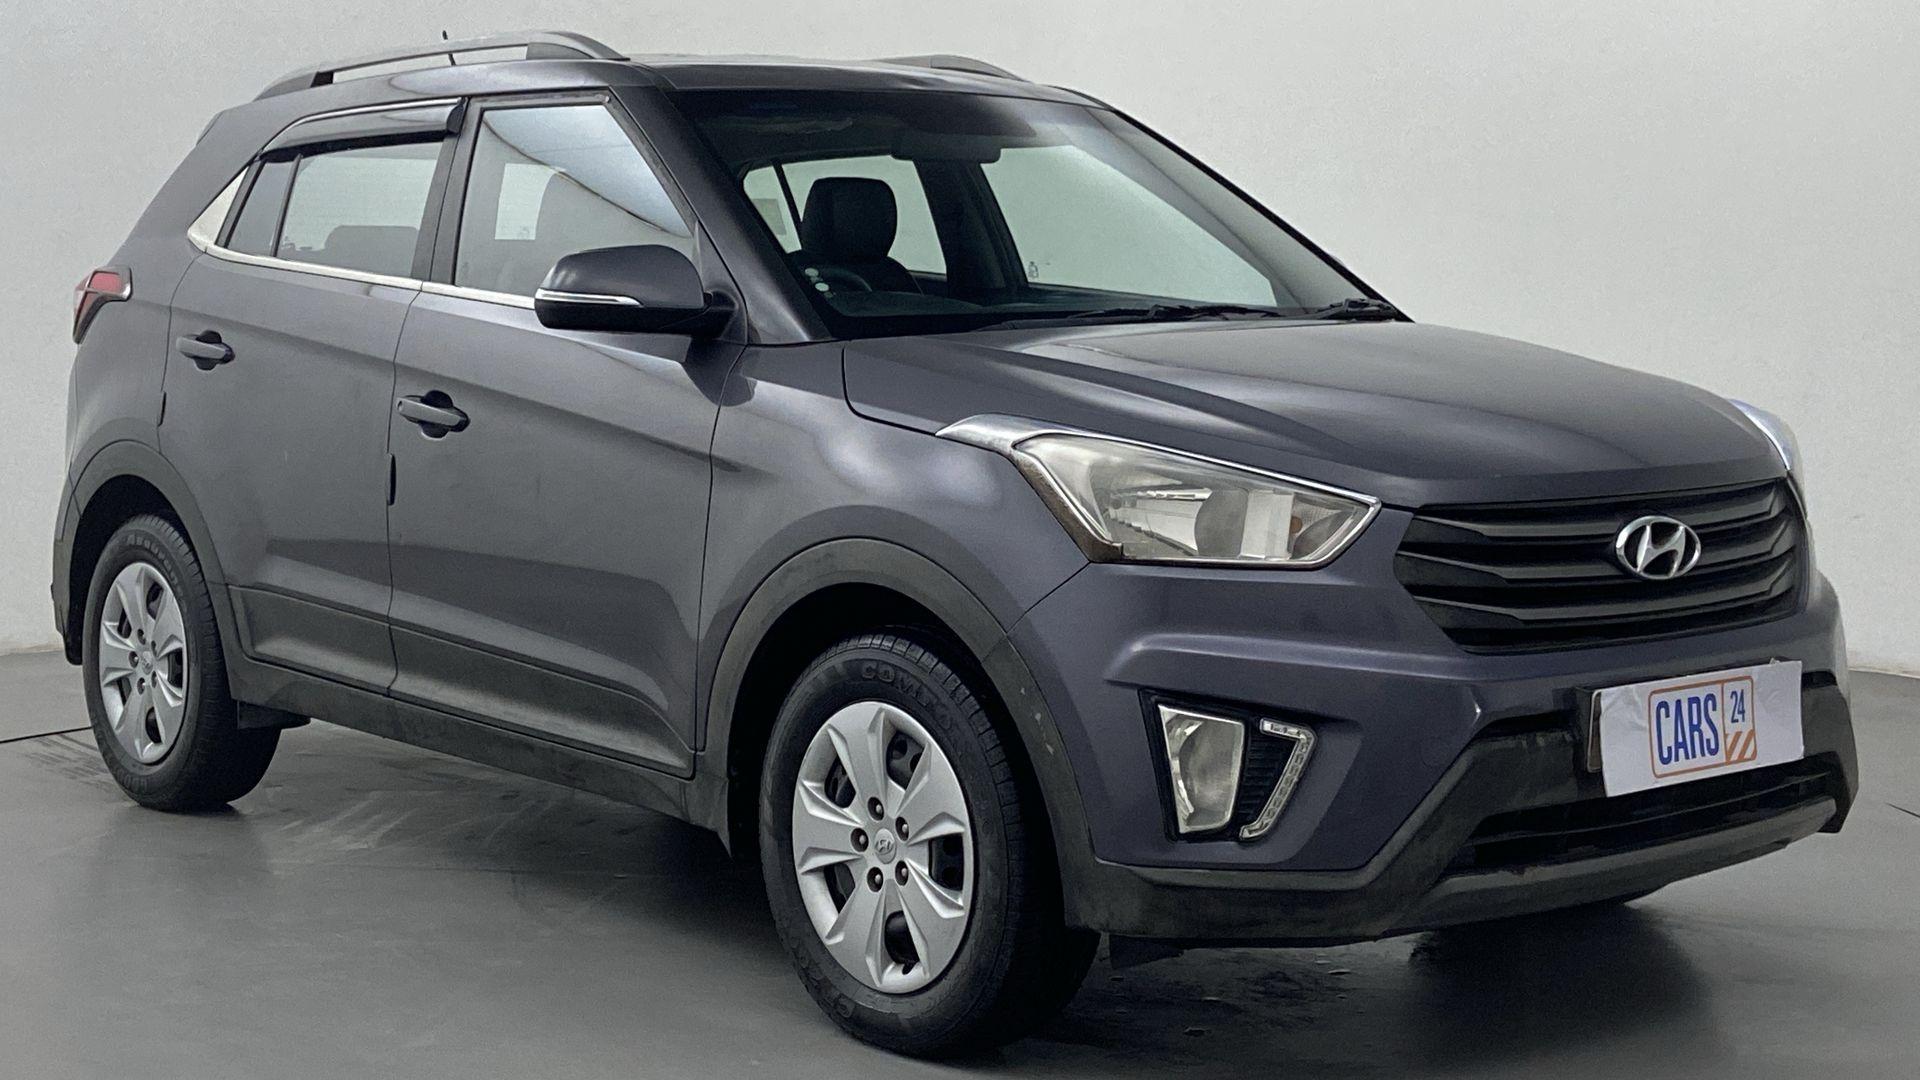 2015 Hyundai Creta 1.4 S CRDI